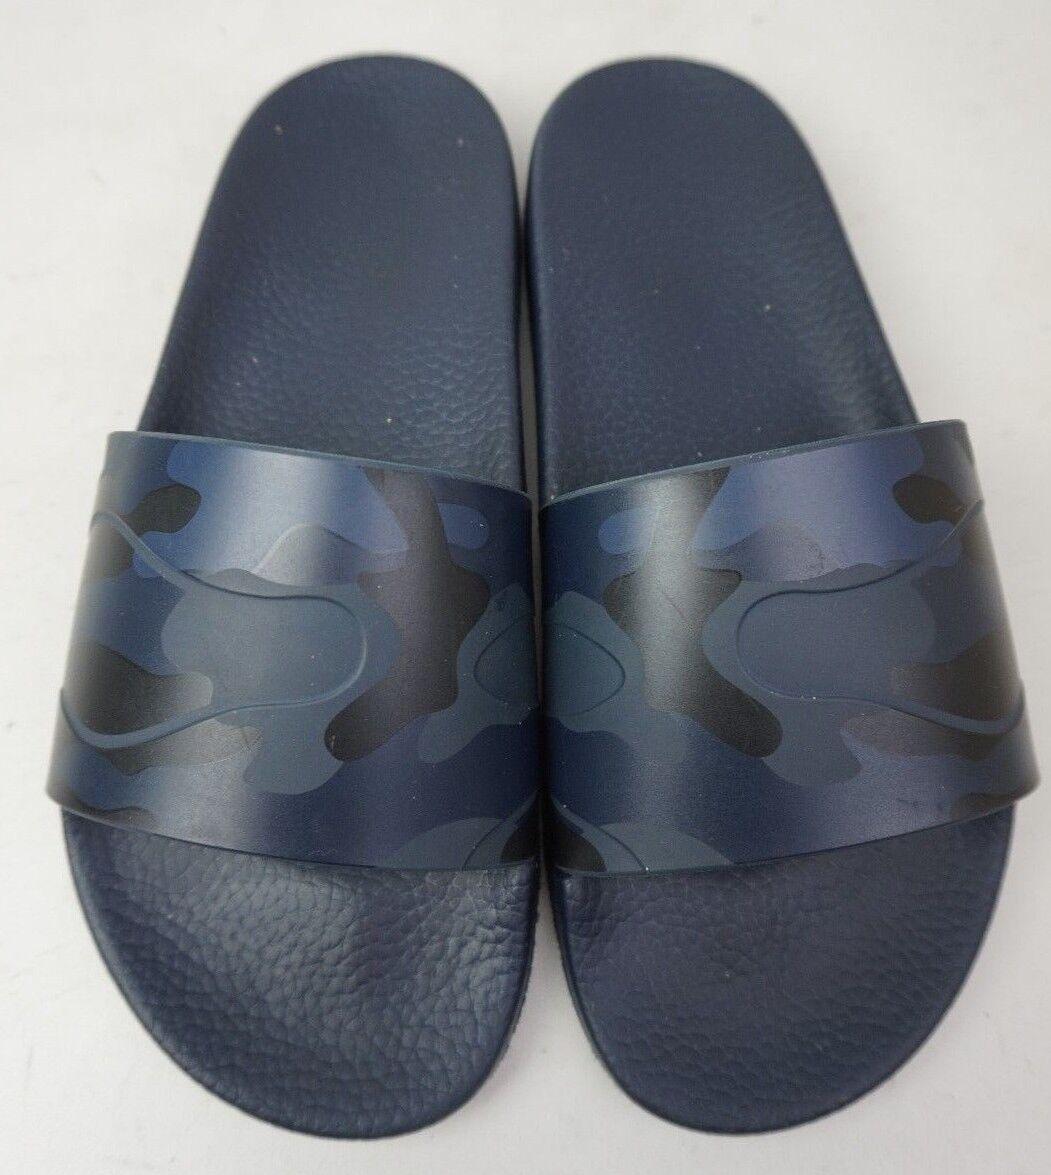 Valentino Men's Camo Slide Navy Sandals Navy Slide Black Shoes Size 40 EU / 7 US dc0b8c